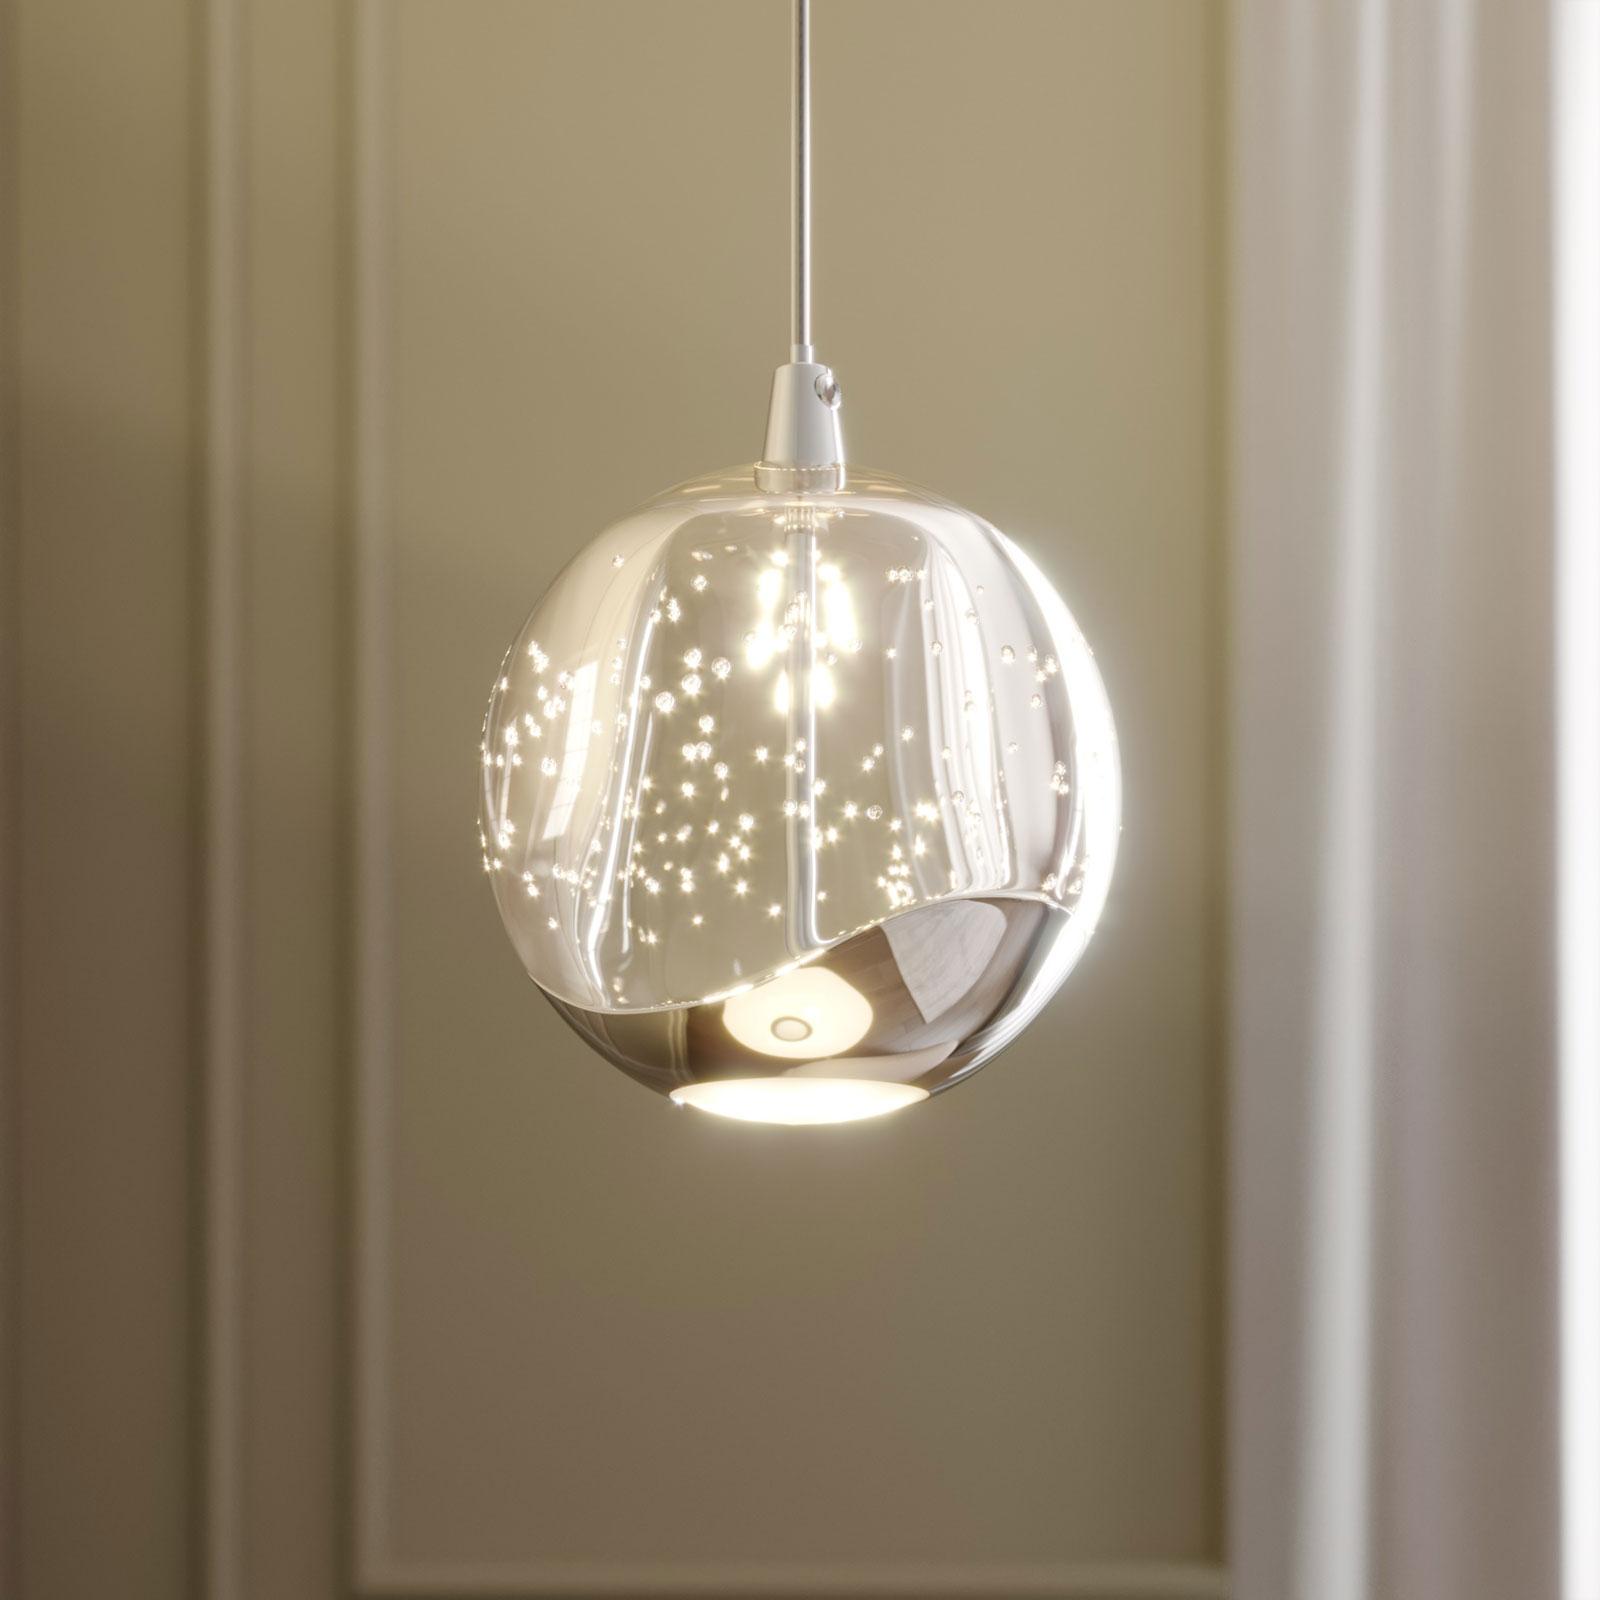 LED-pendellampe Hayley, 1 lyskilde, krom